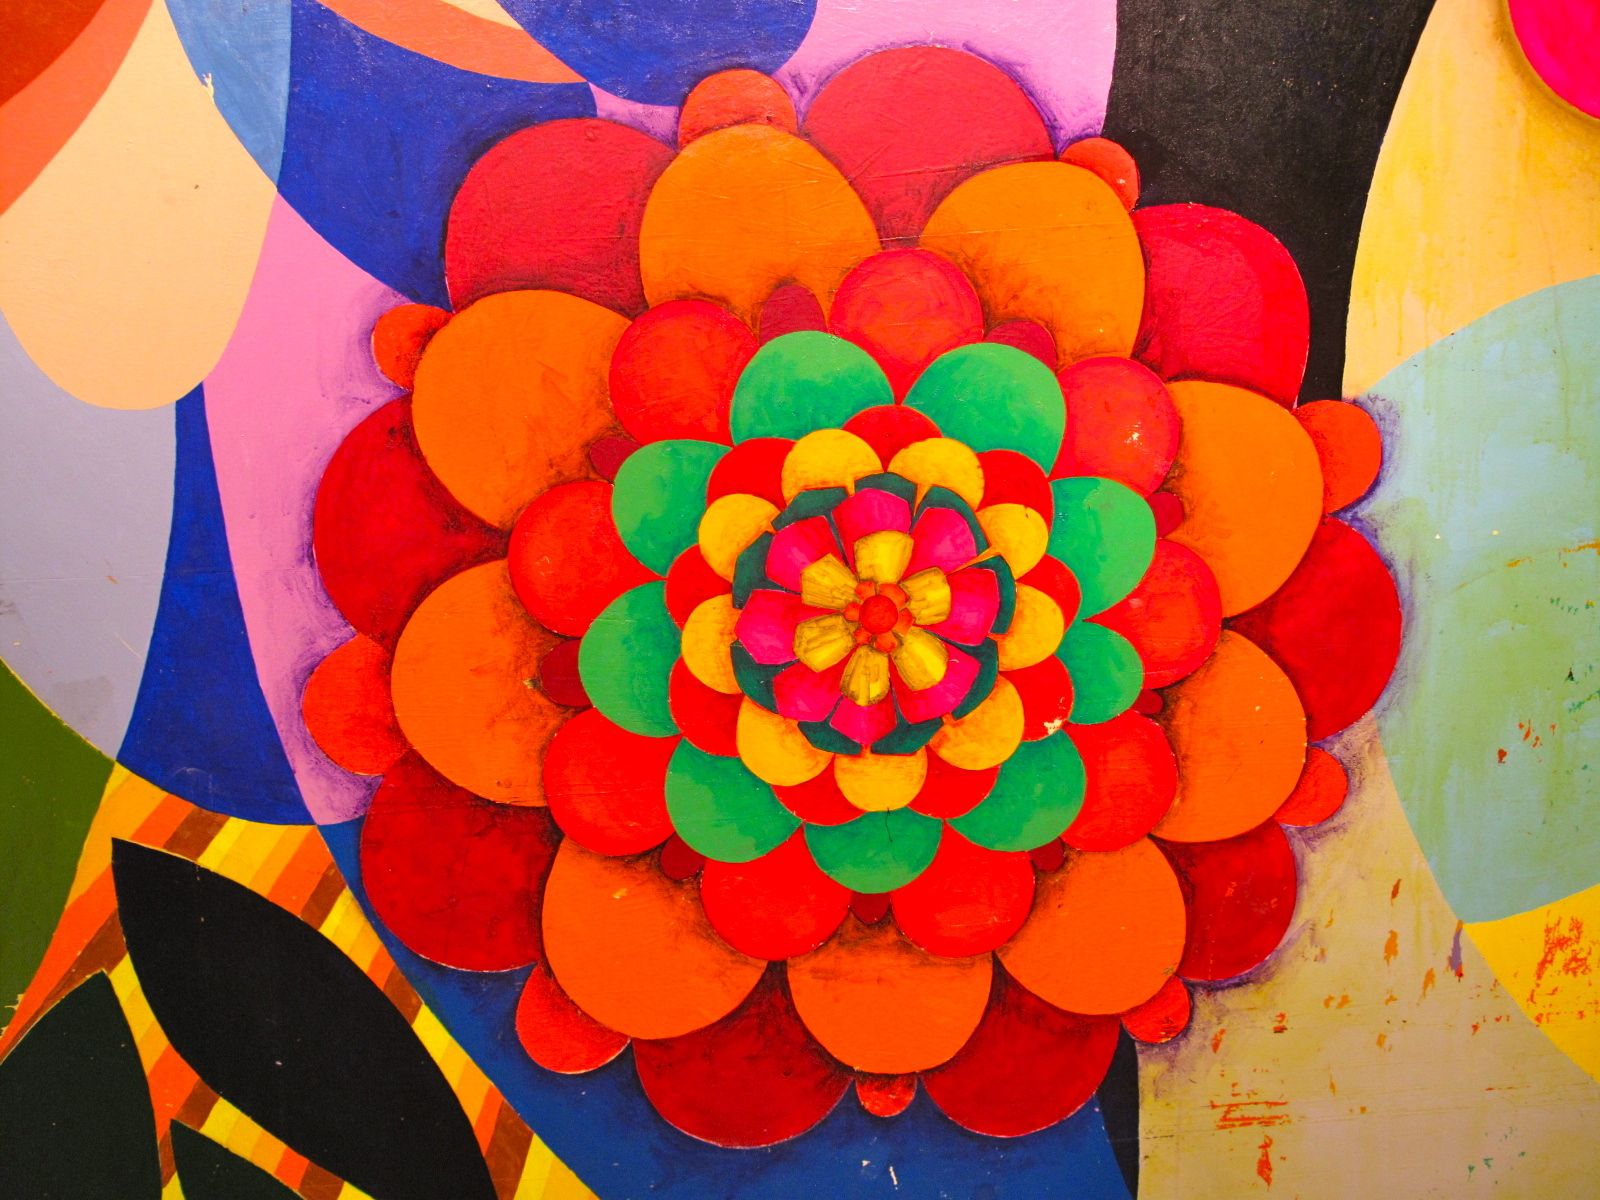 Beatriz Milhazes | art ~ flower power | Pinterest